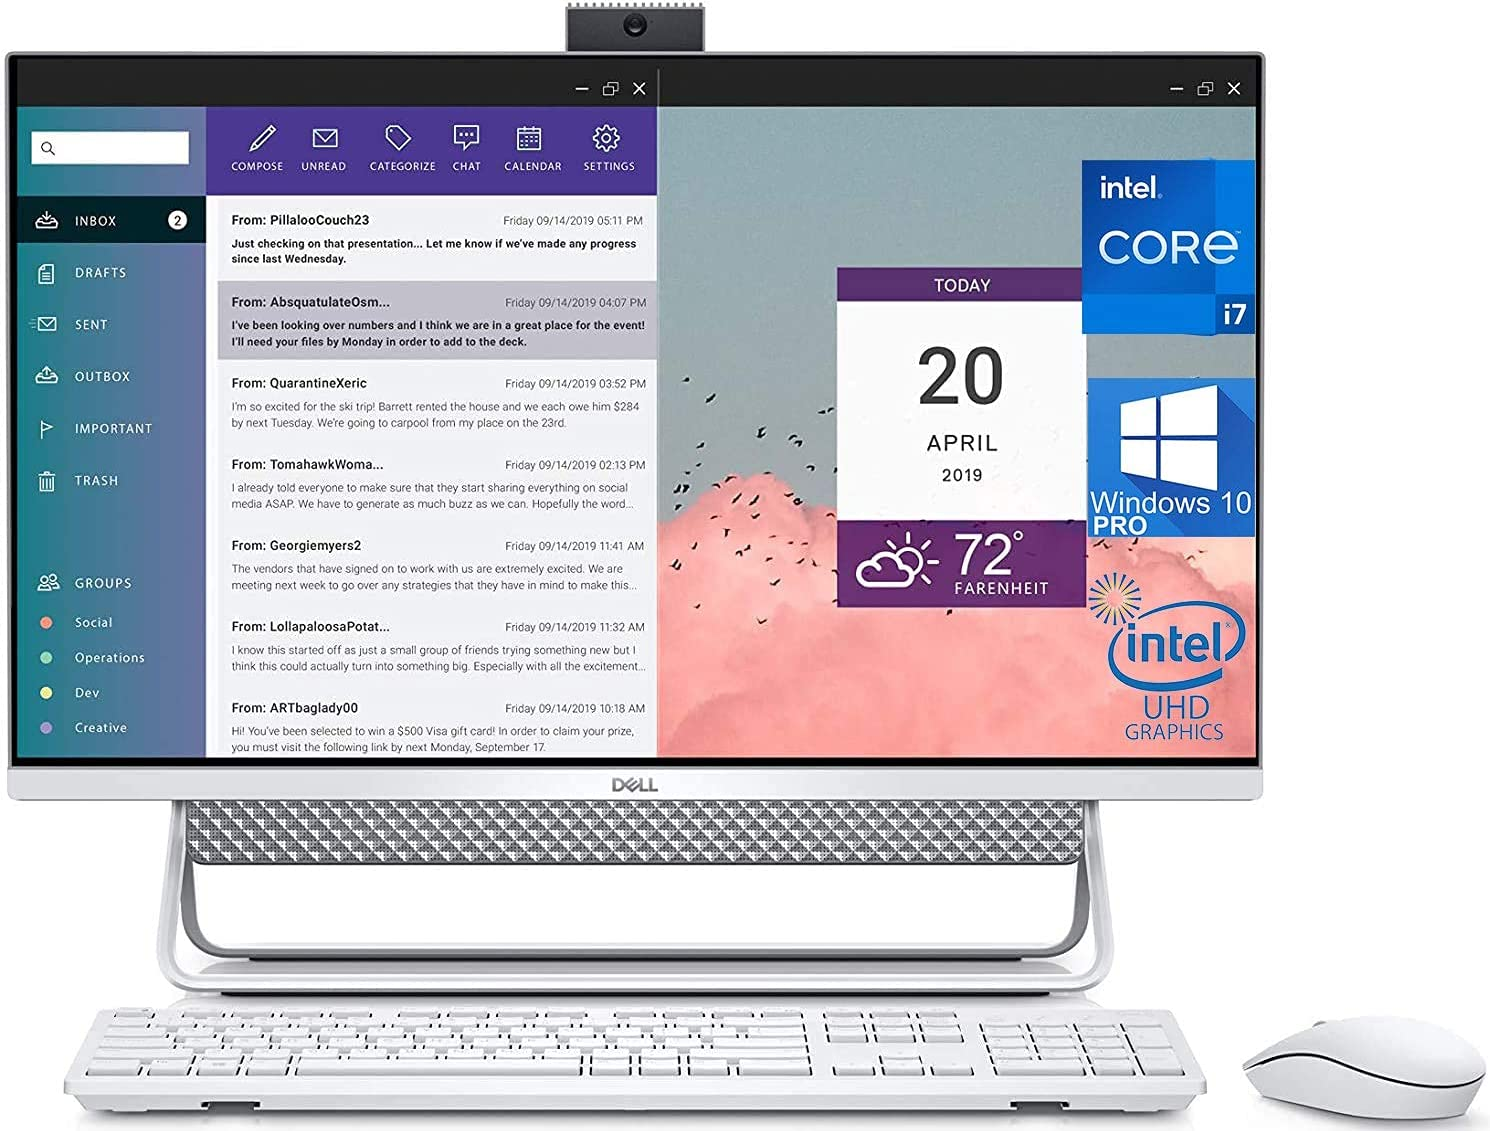 "Dell Inspiron 7700 All in One, 27"" FHD Touchscreen, Intel 11th Gen i7-1165G7, 16GB RAM, 2TB SSD, Webcam, Nvidia Geforce MX330 2GB Graphics, HDMI, SD-Card, USB Type-C - Windows 10 Pro (Renewed)"